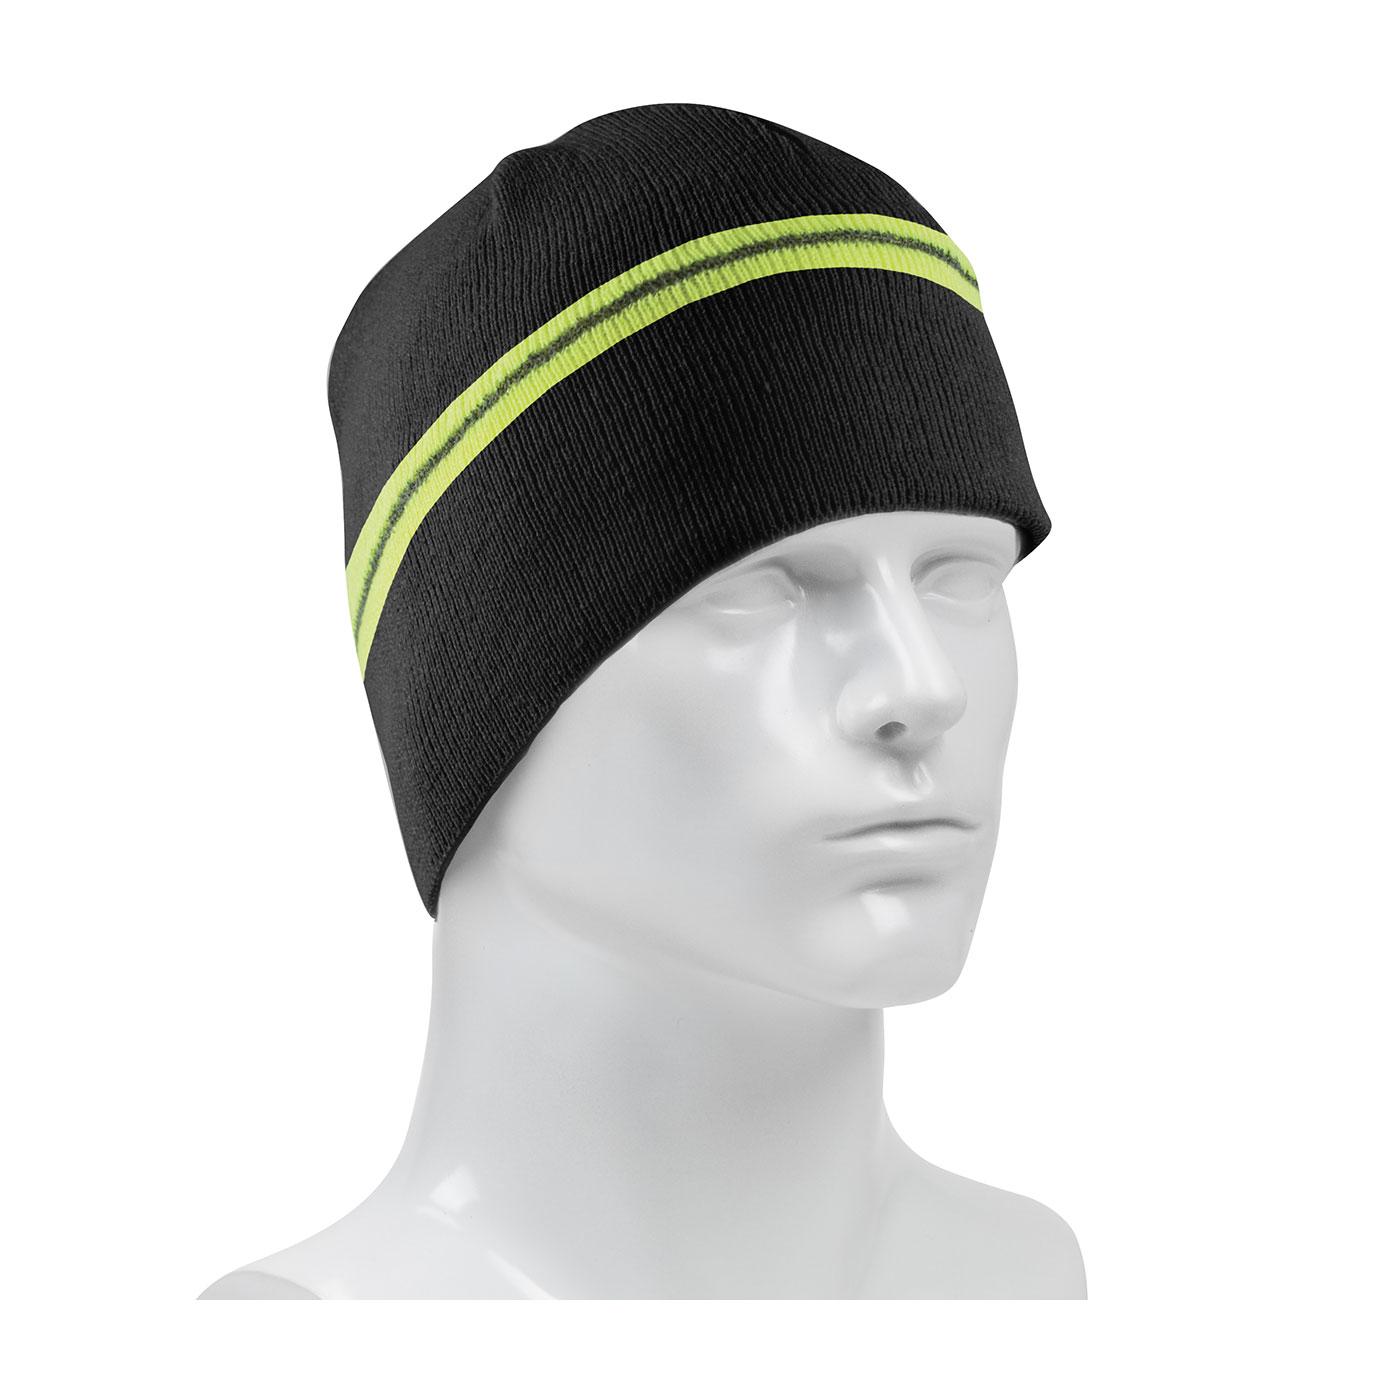 PIP® 290-9001XL Ambidextrous Elbow Sleeve, XL, Terry Lined Neoprene/Nylon, Black